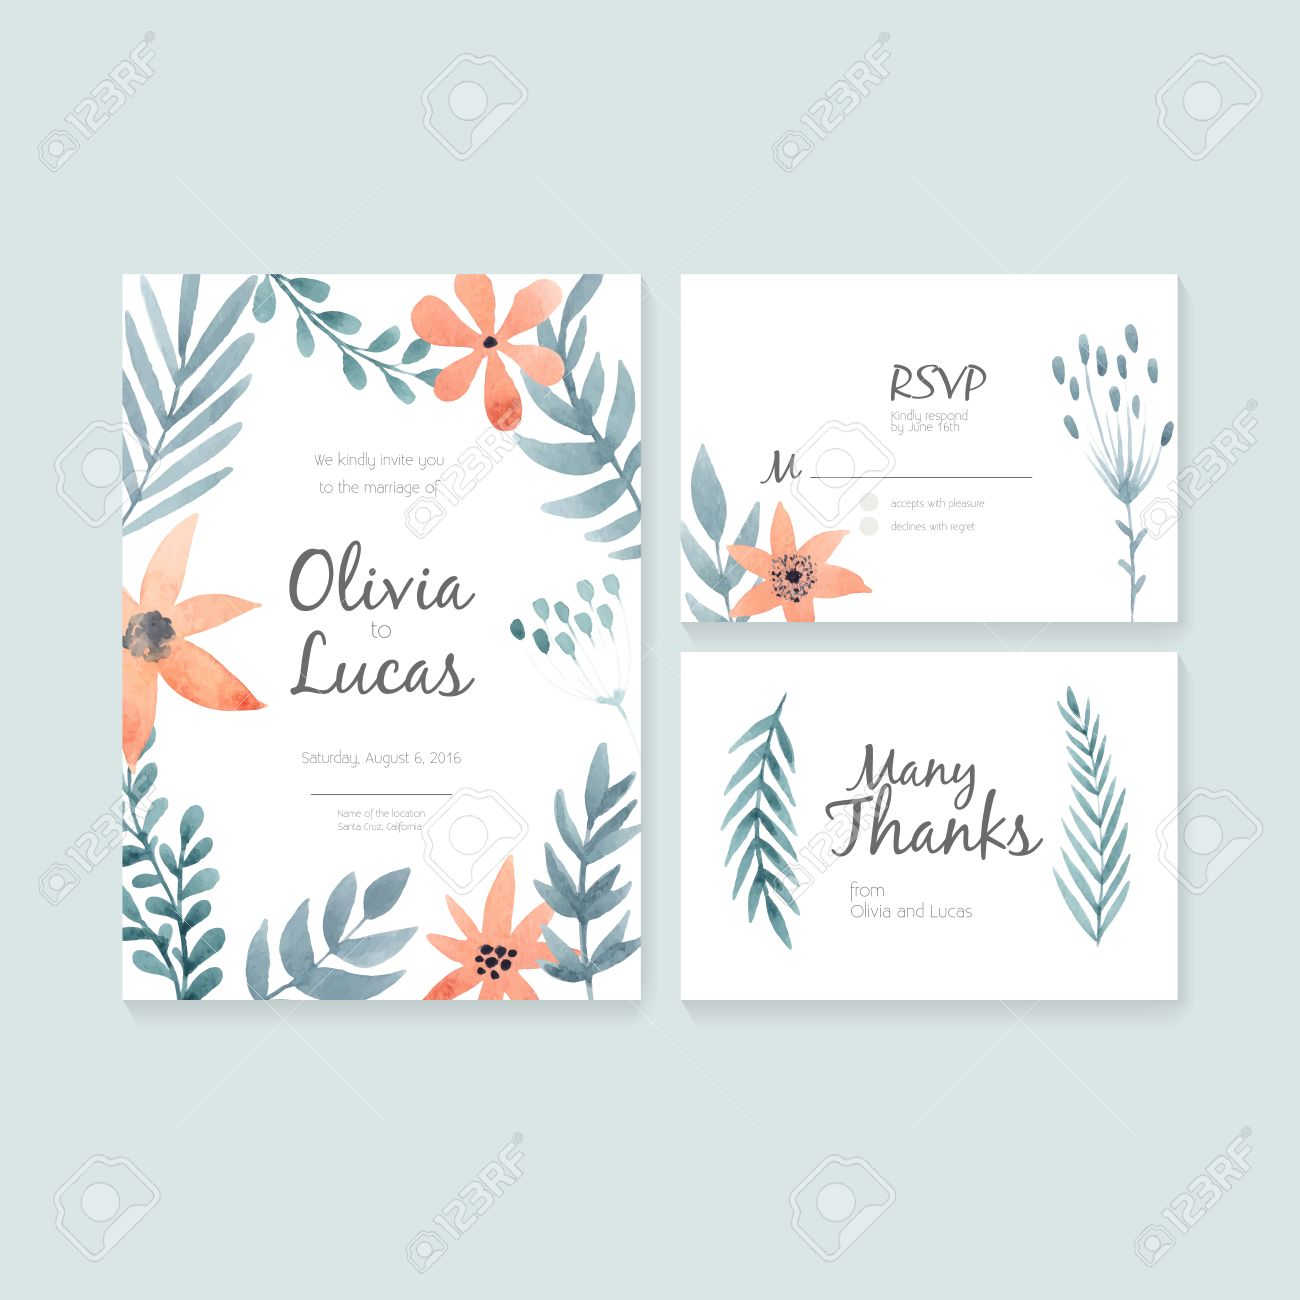 Unique Gentle Vector Wedding Cards Template With Watercolor ...